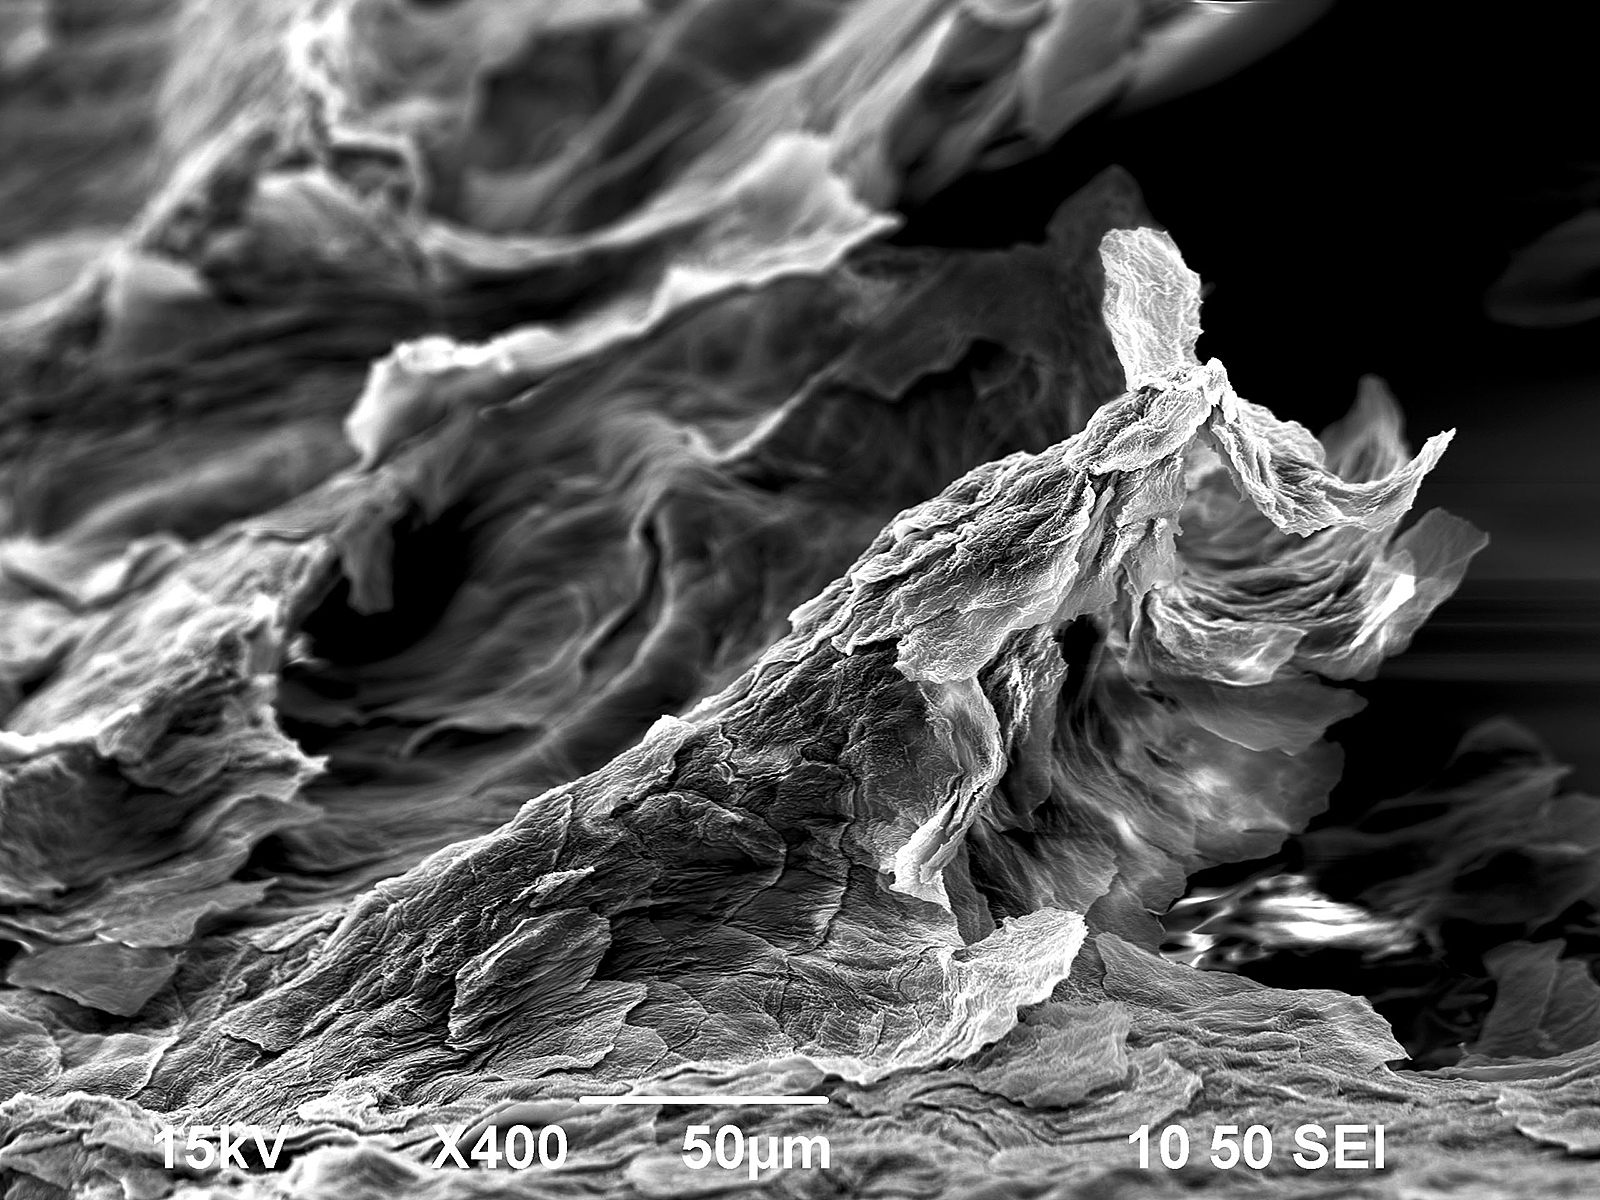 Flake of dry human skin